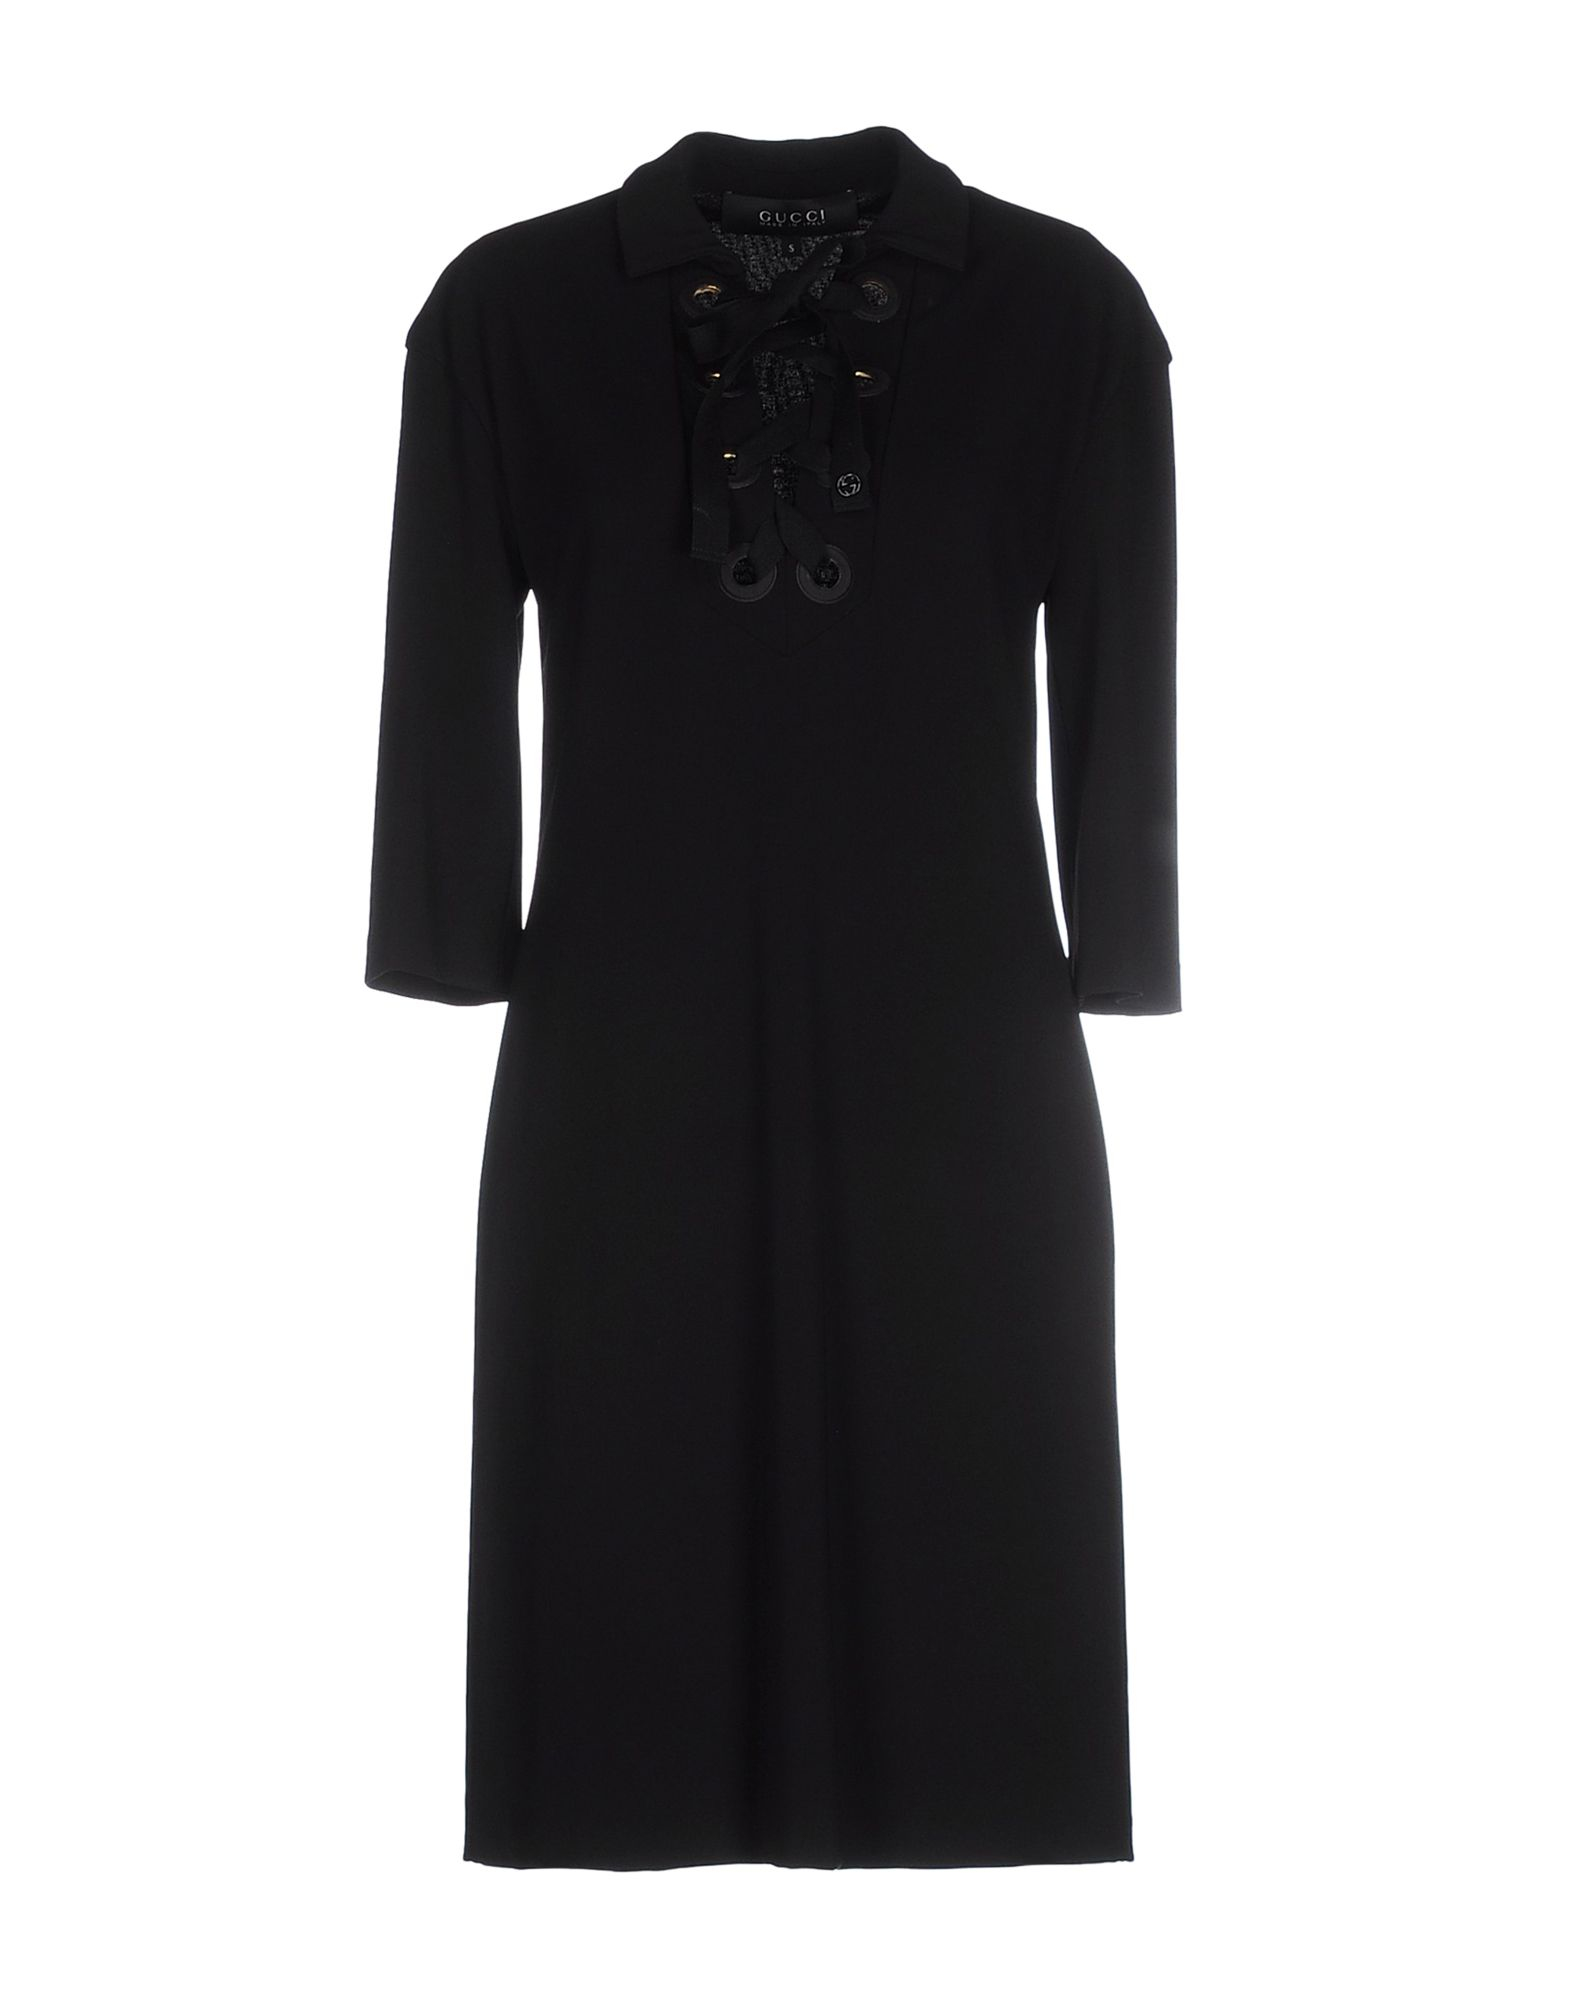 gucci short dress in black lyst